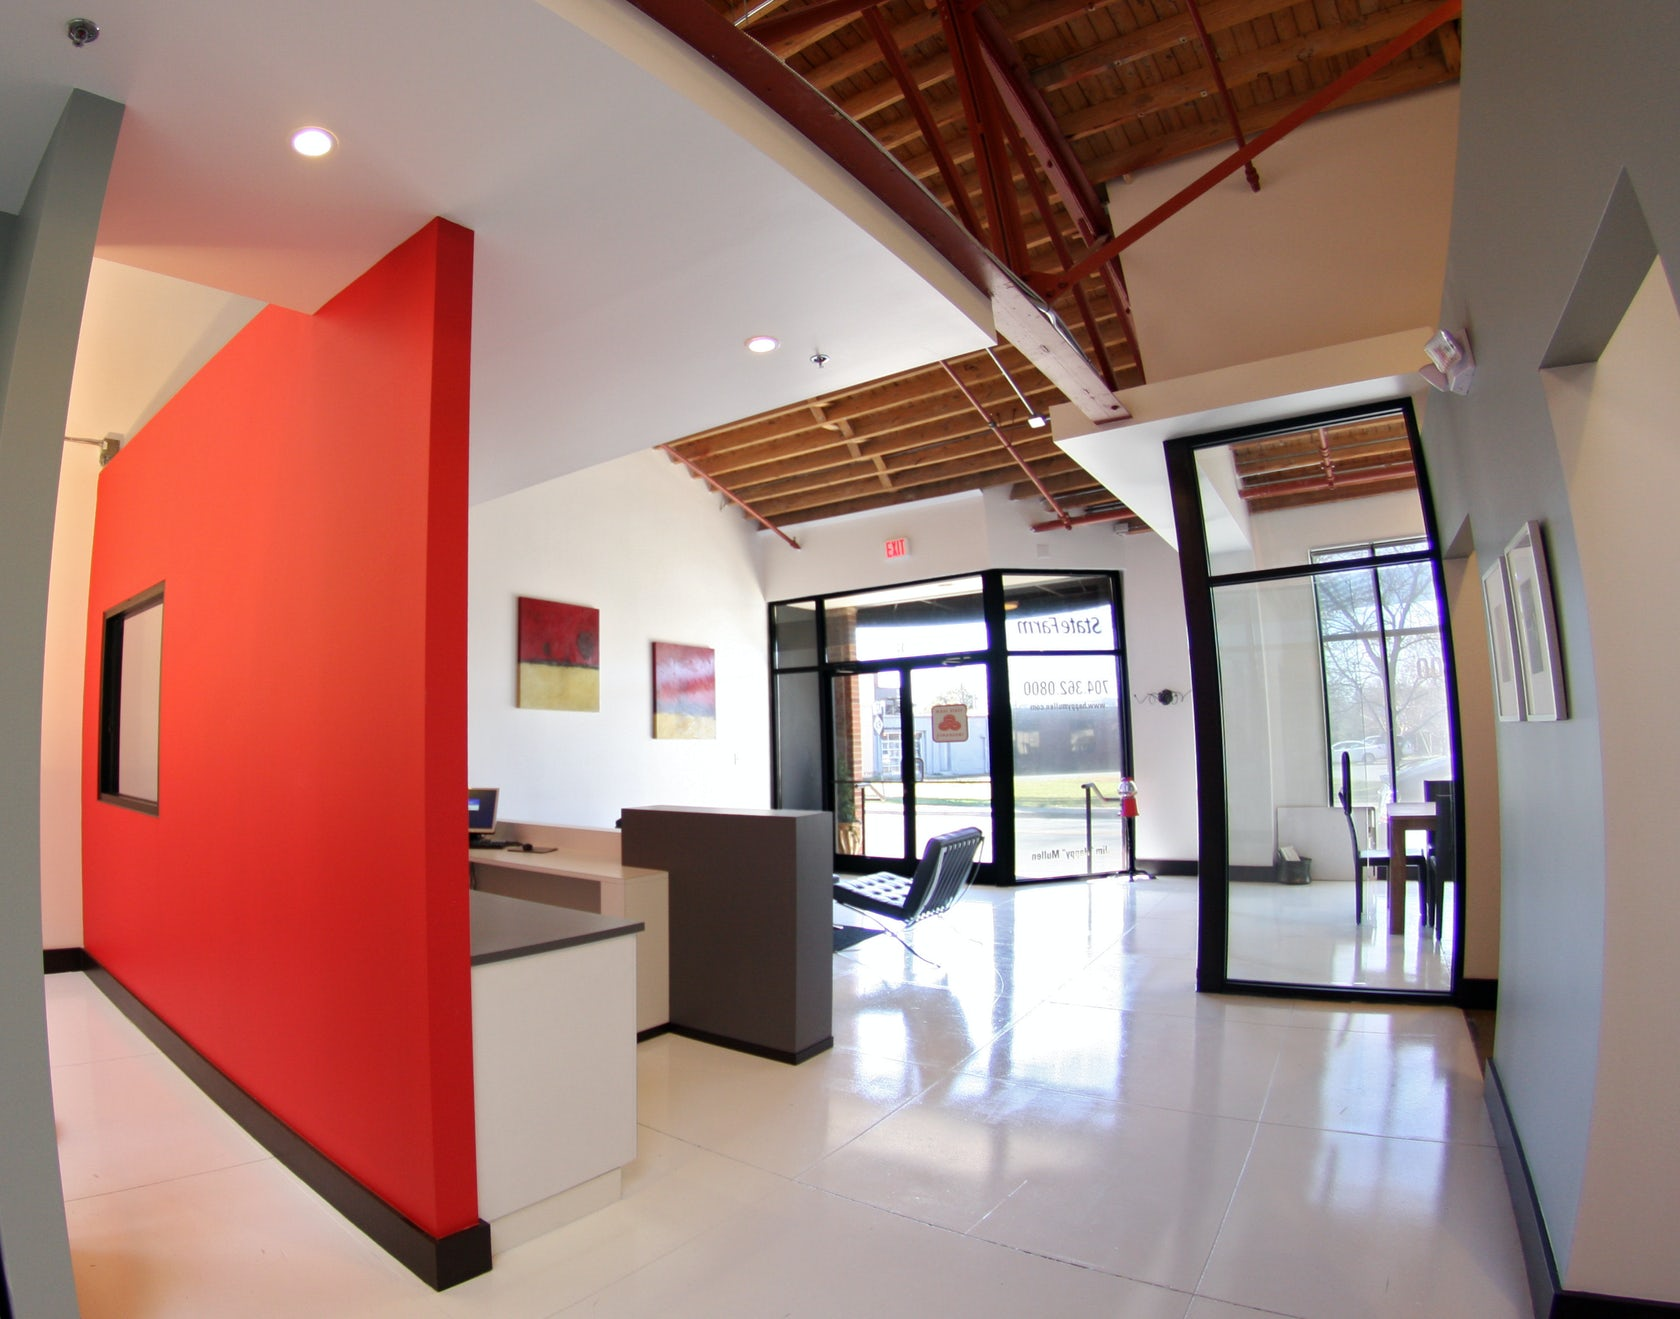 State farm architizer - Interior design firms charlotte nc ...